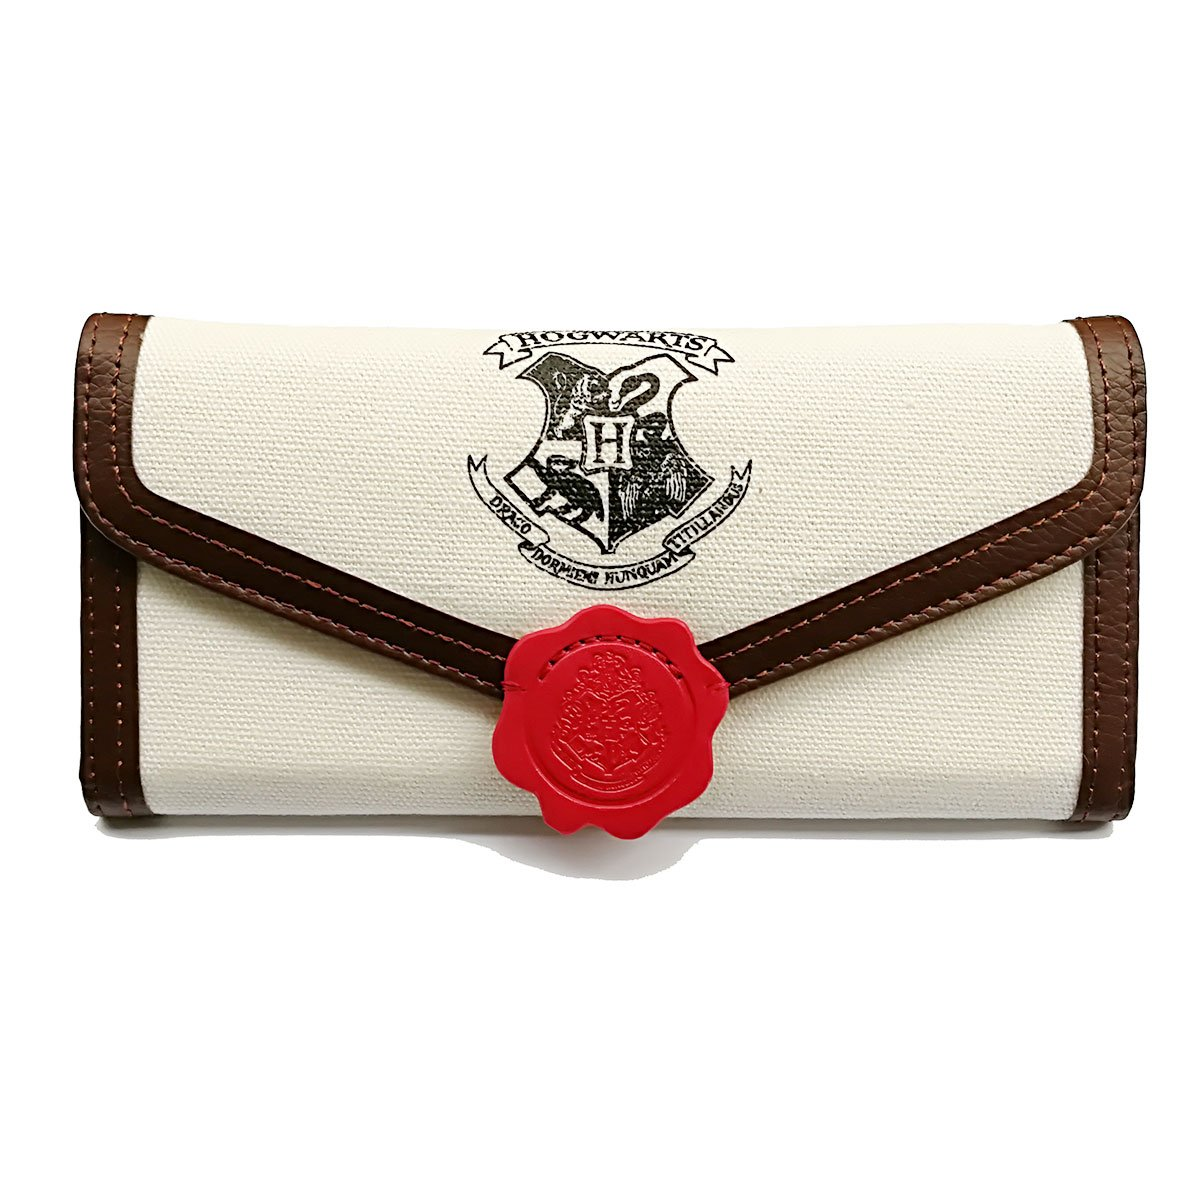 Women's Wallet for Harry Potter Fans Designer Hogwarts Slim Small Card Holder Wallet for Women